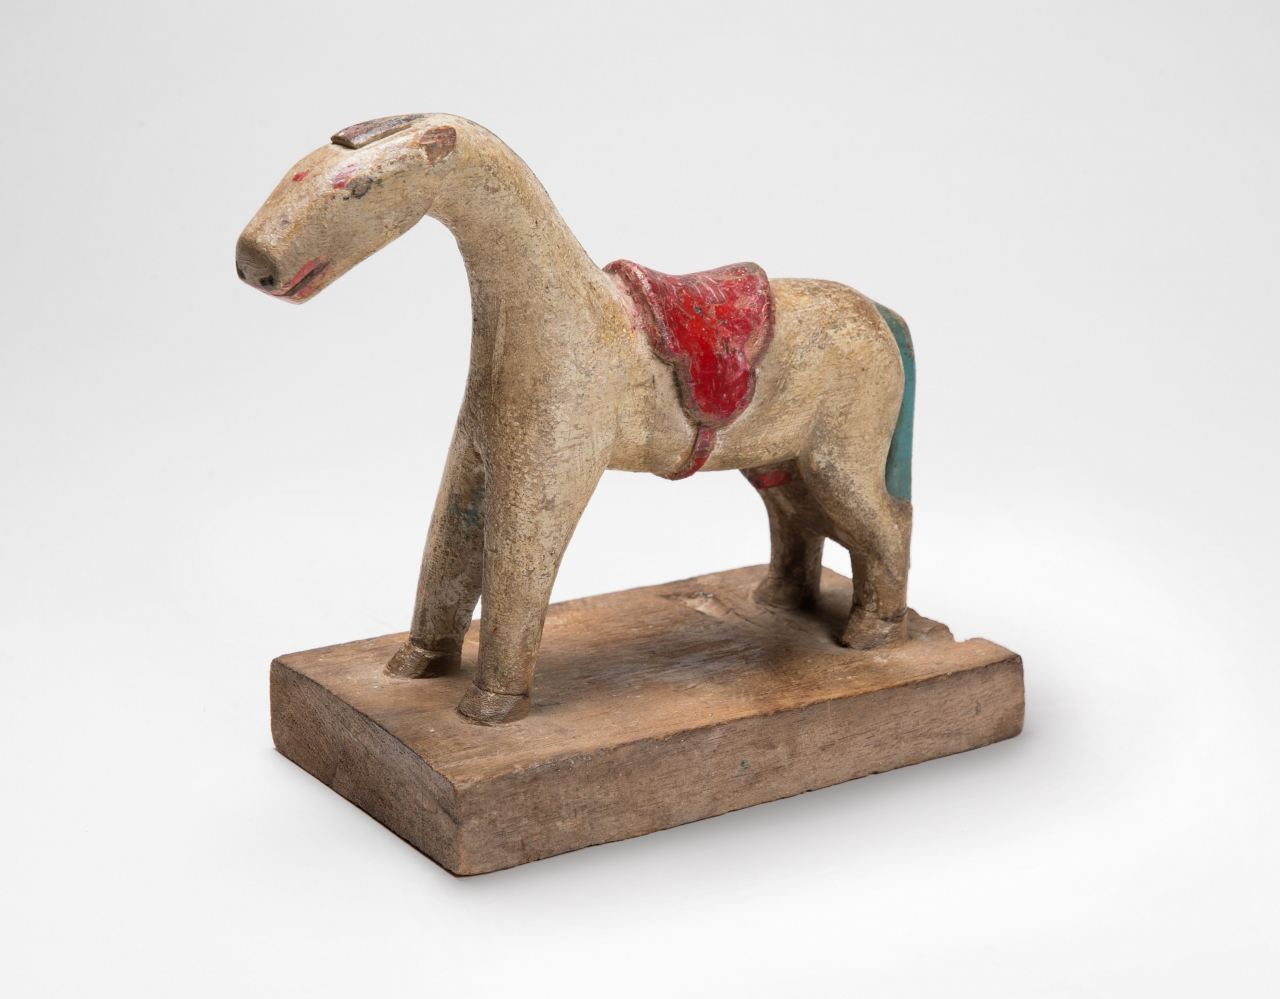 Primitive Folk Art piece - Small wooden folk art horse from N. Thailand - Early 1900's